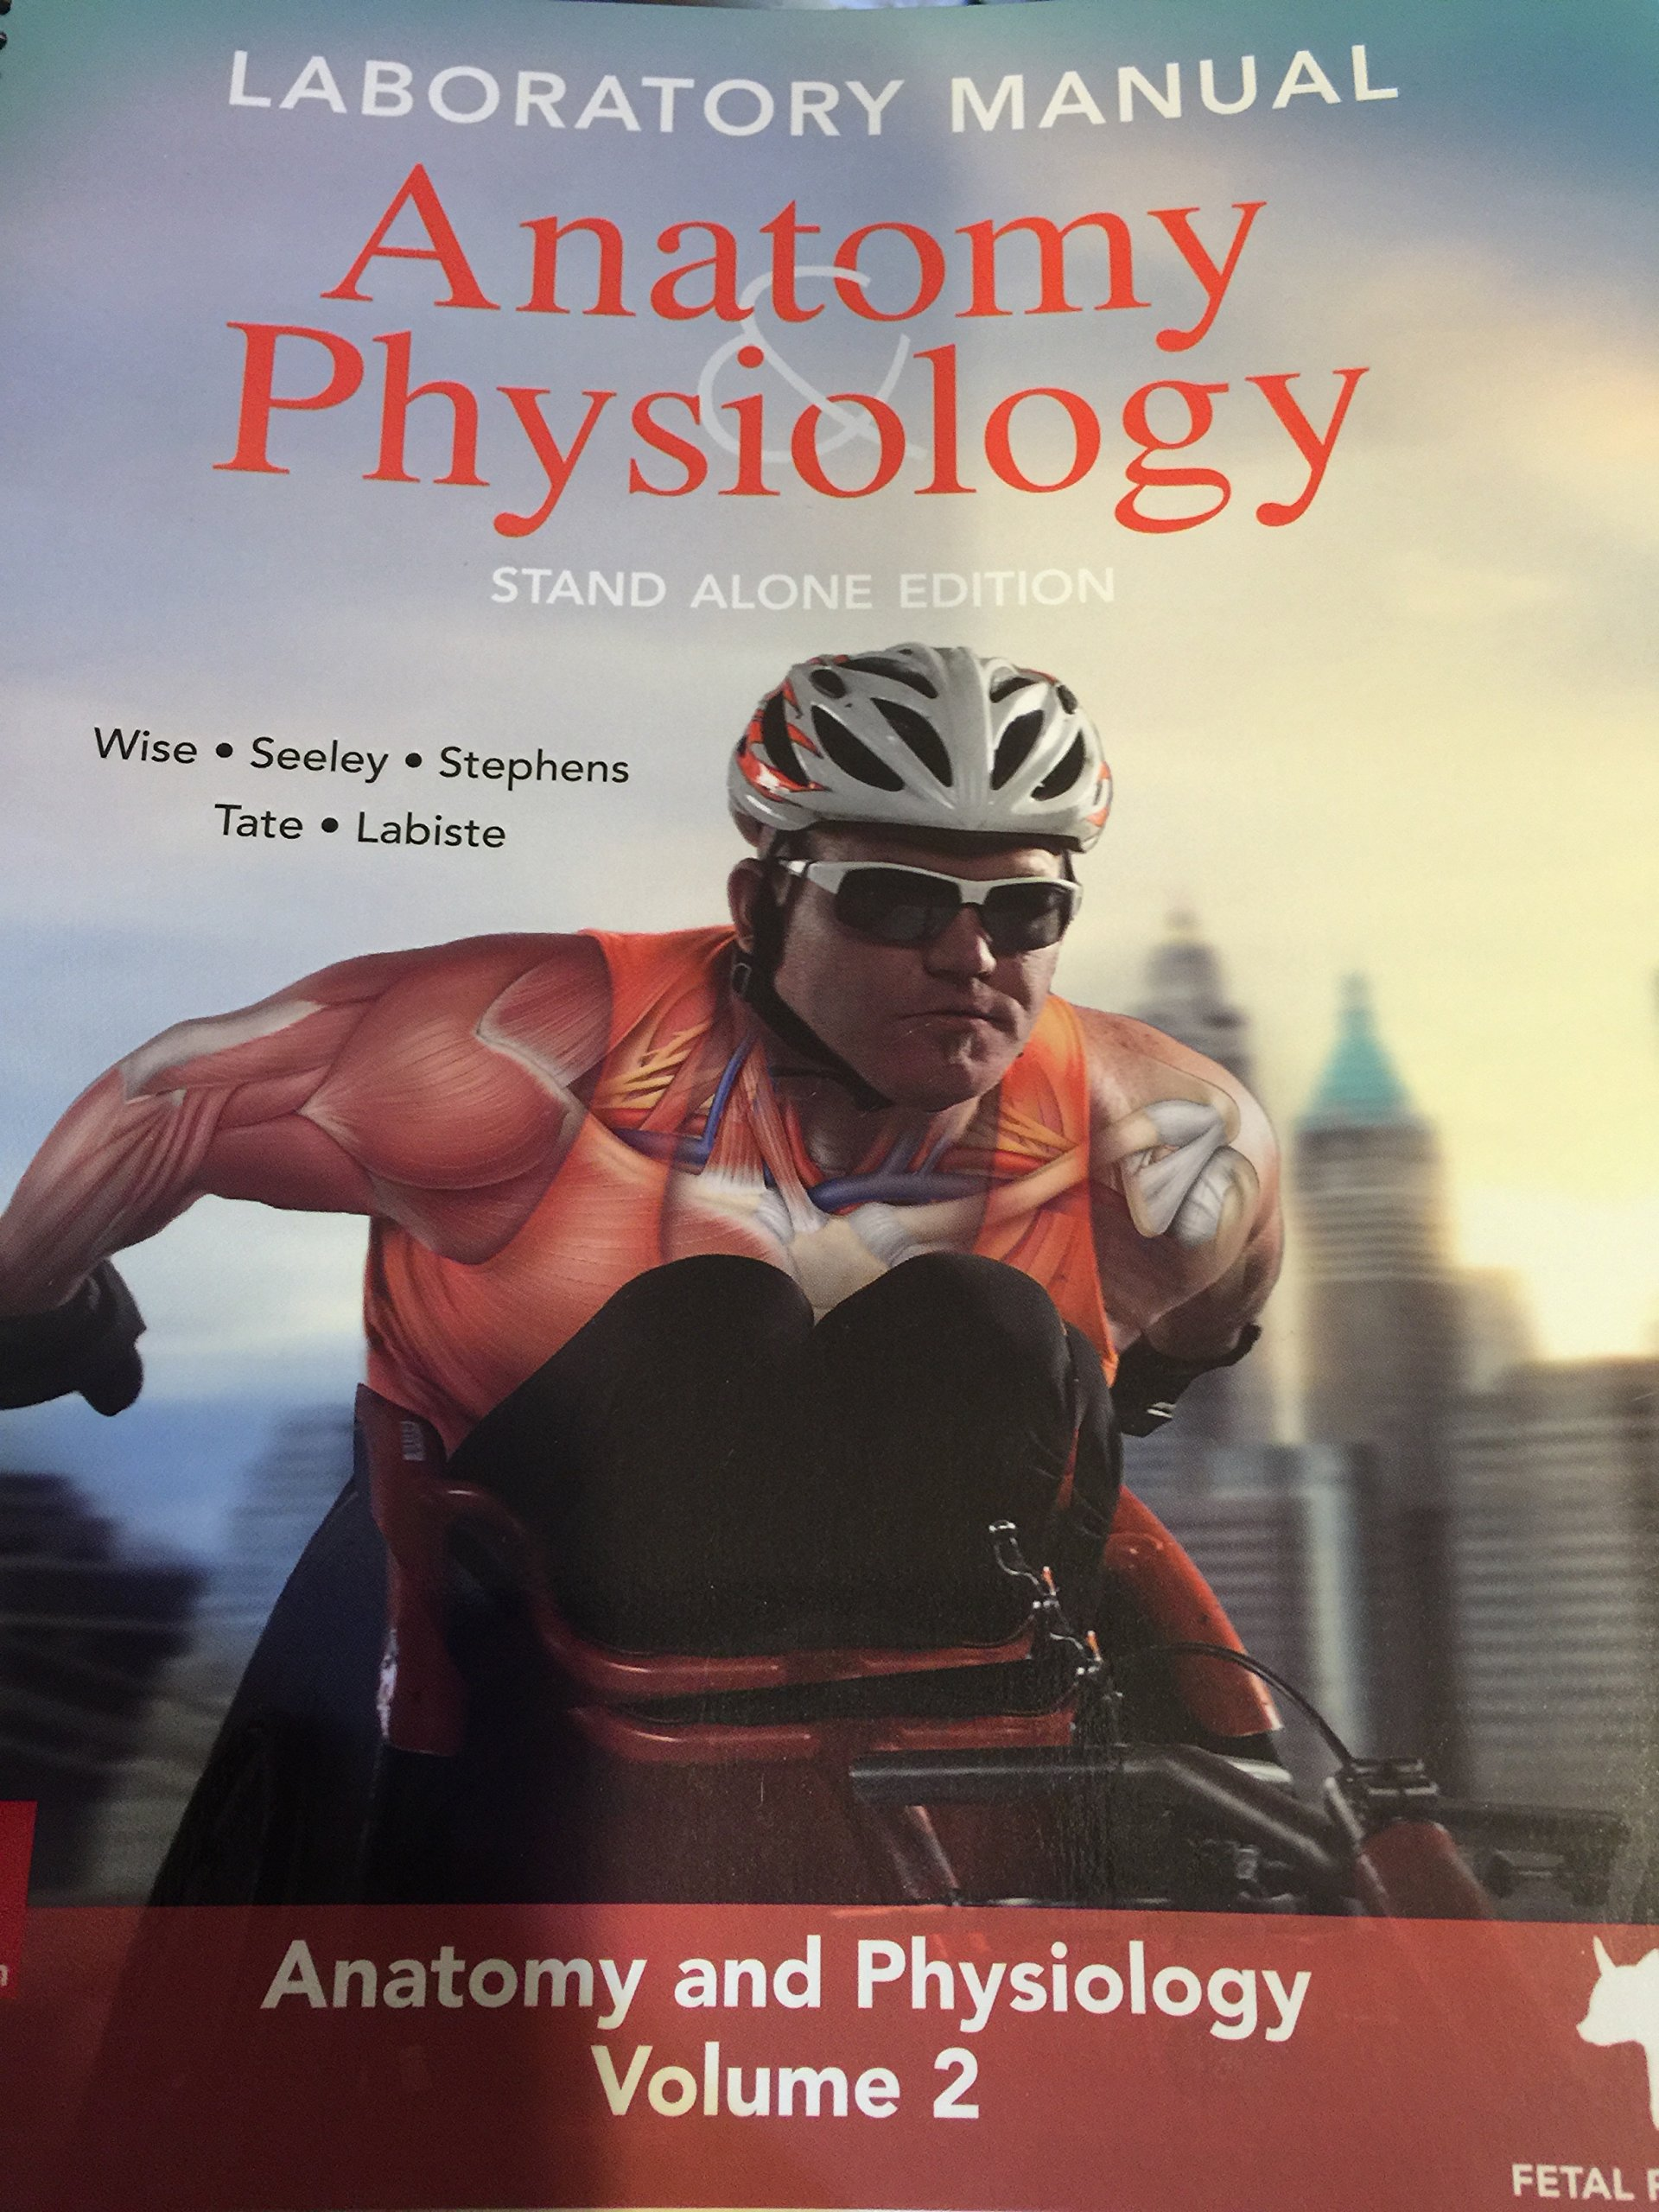 laboratory manual Anatomy and Physiology Stand Alone Edition: Jose Alberte:  Amazon.com: Books